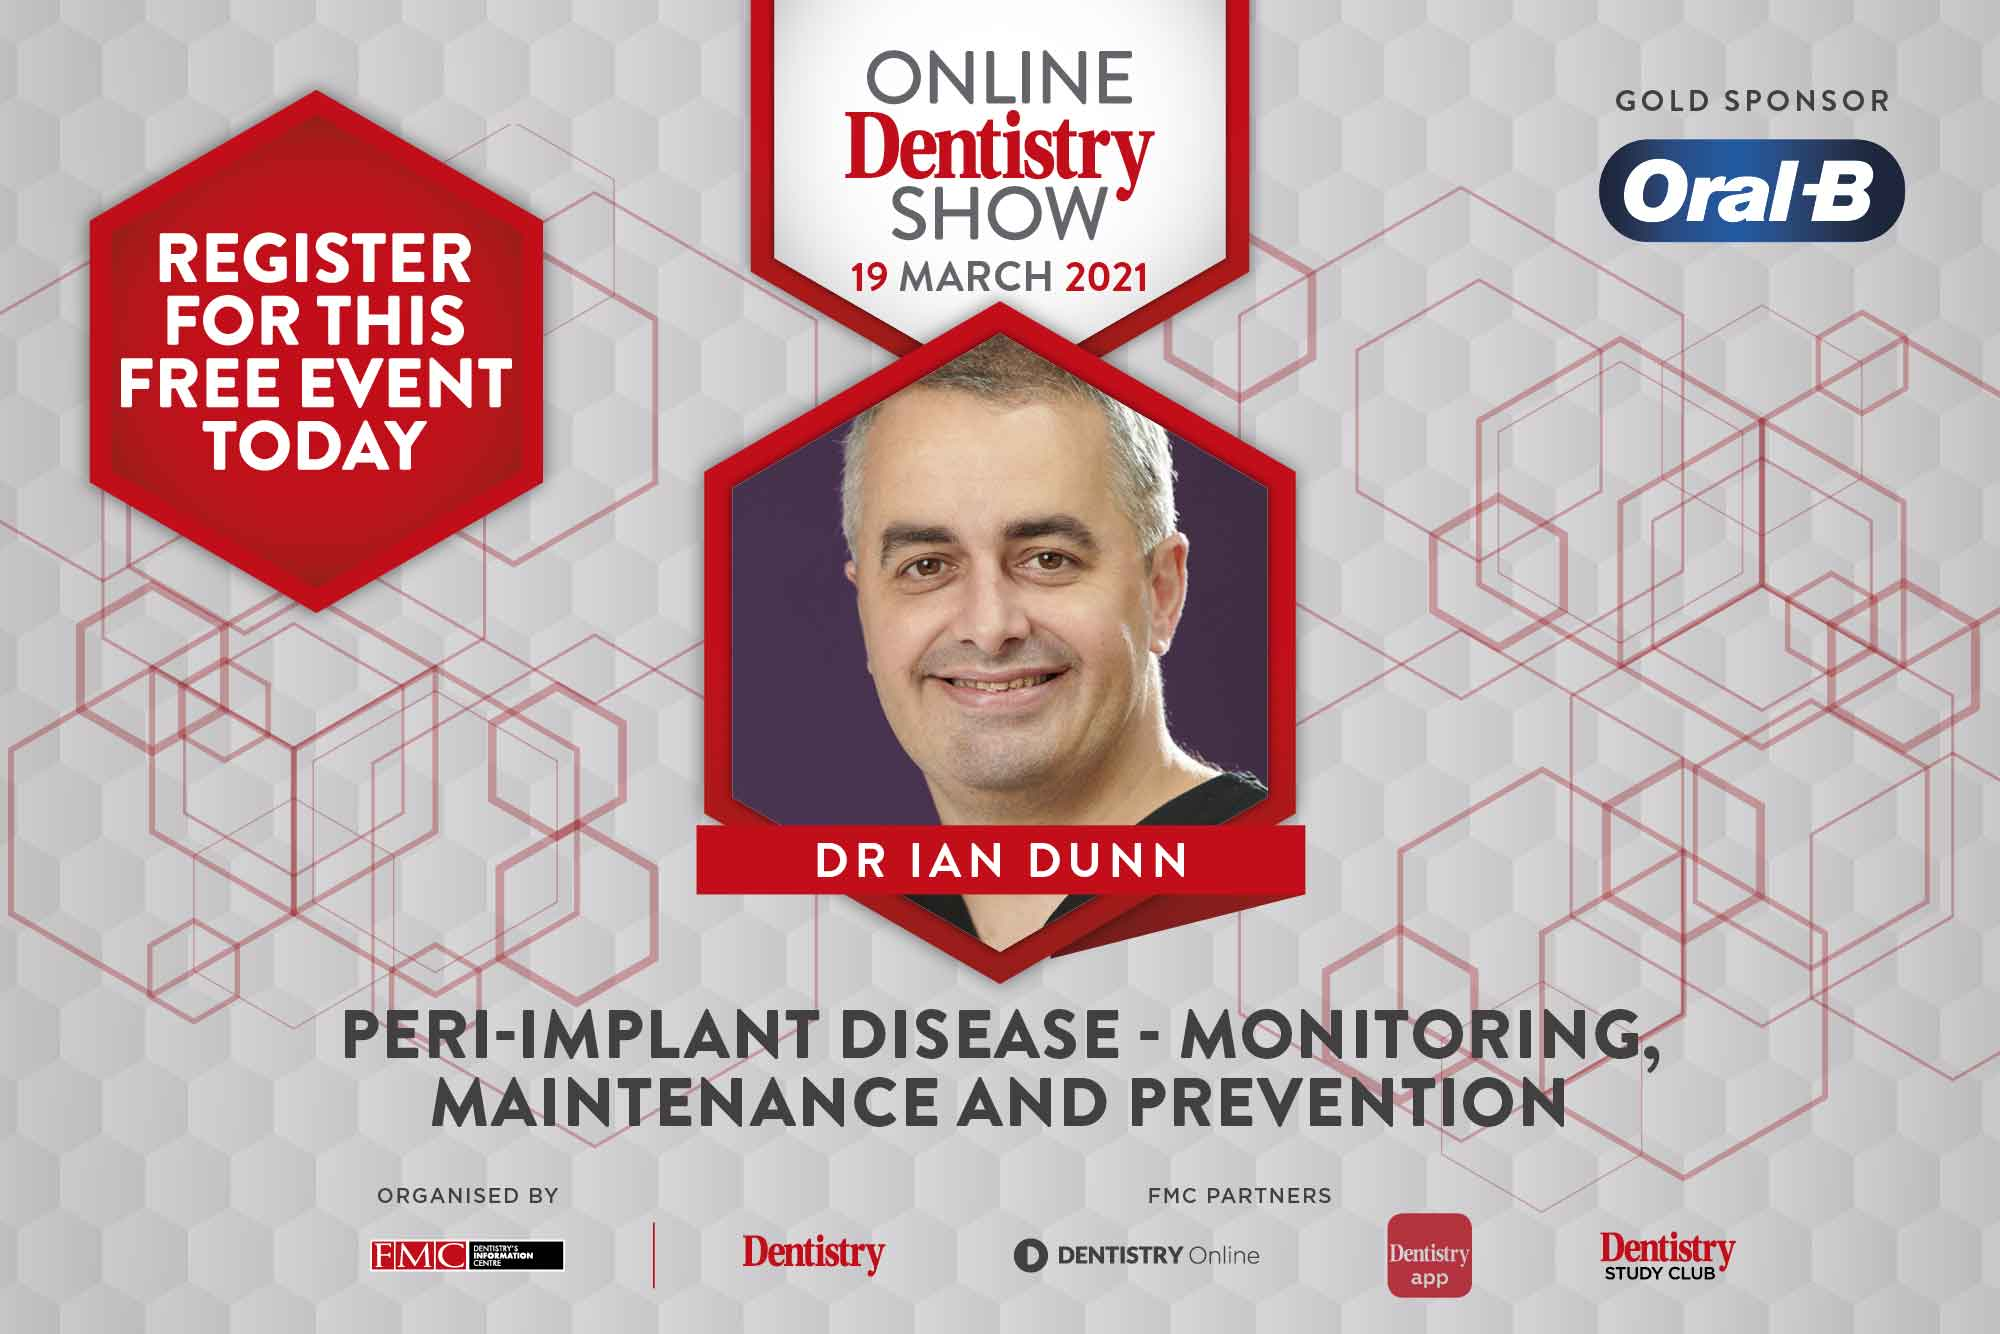 Online Dentistry Show Ian Dunn